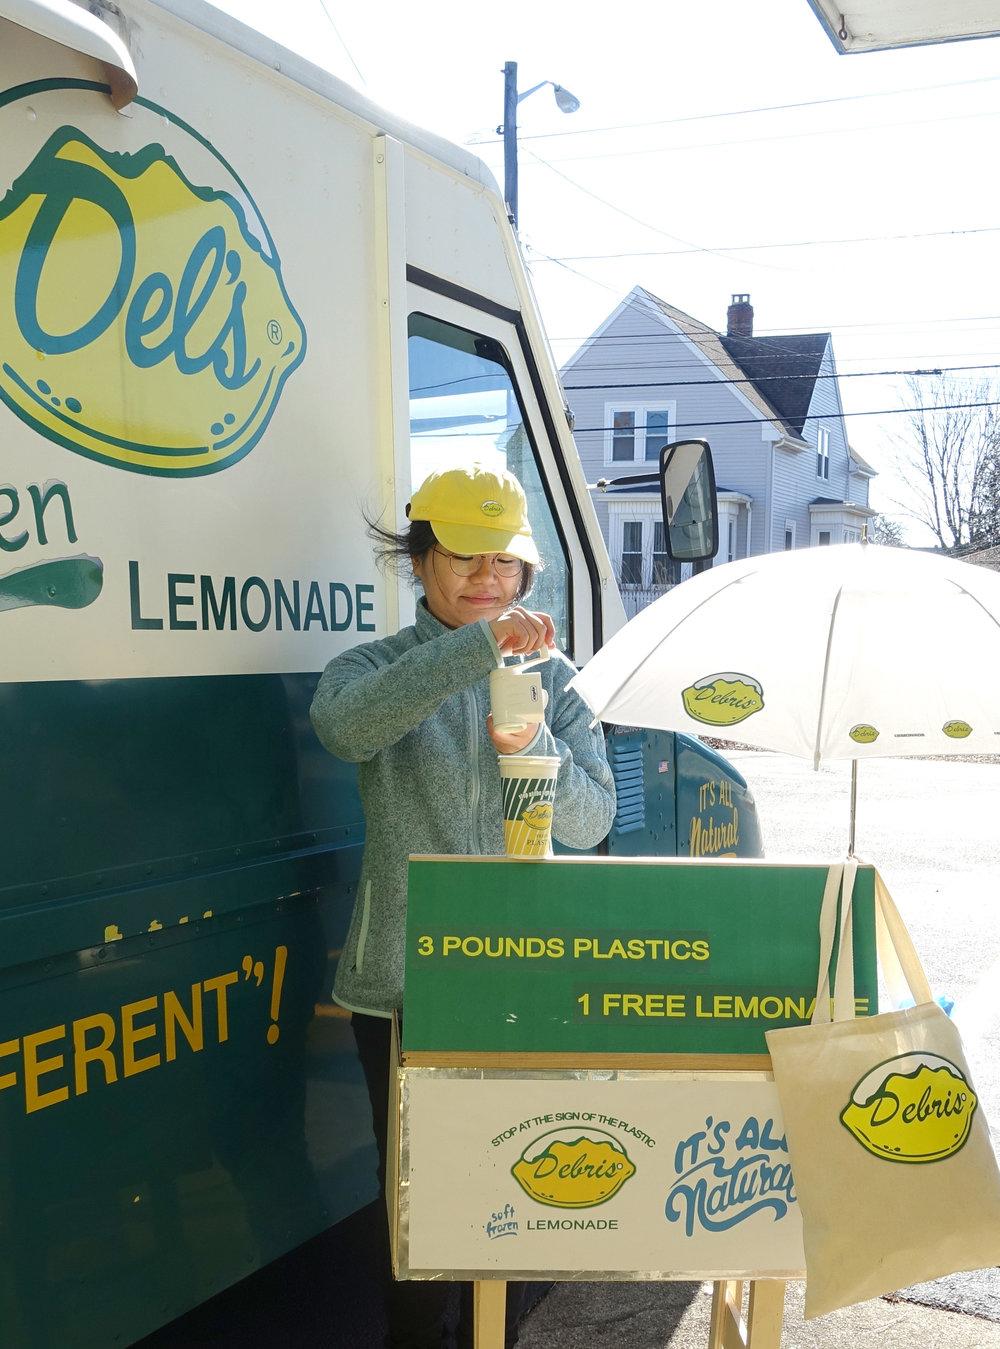 Debris lemonade branding